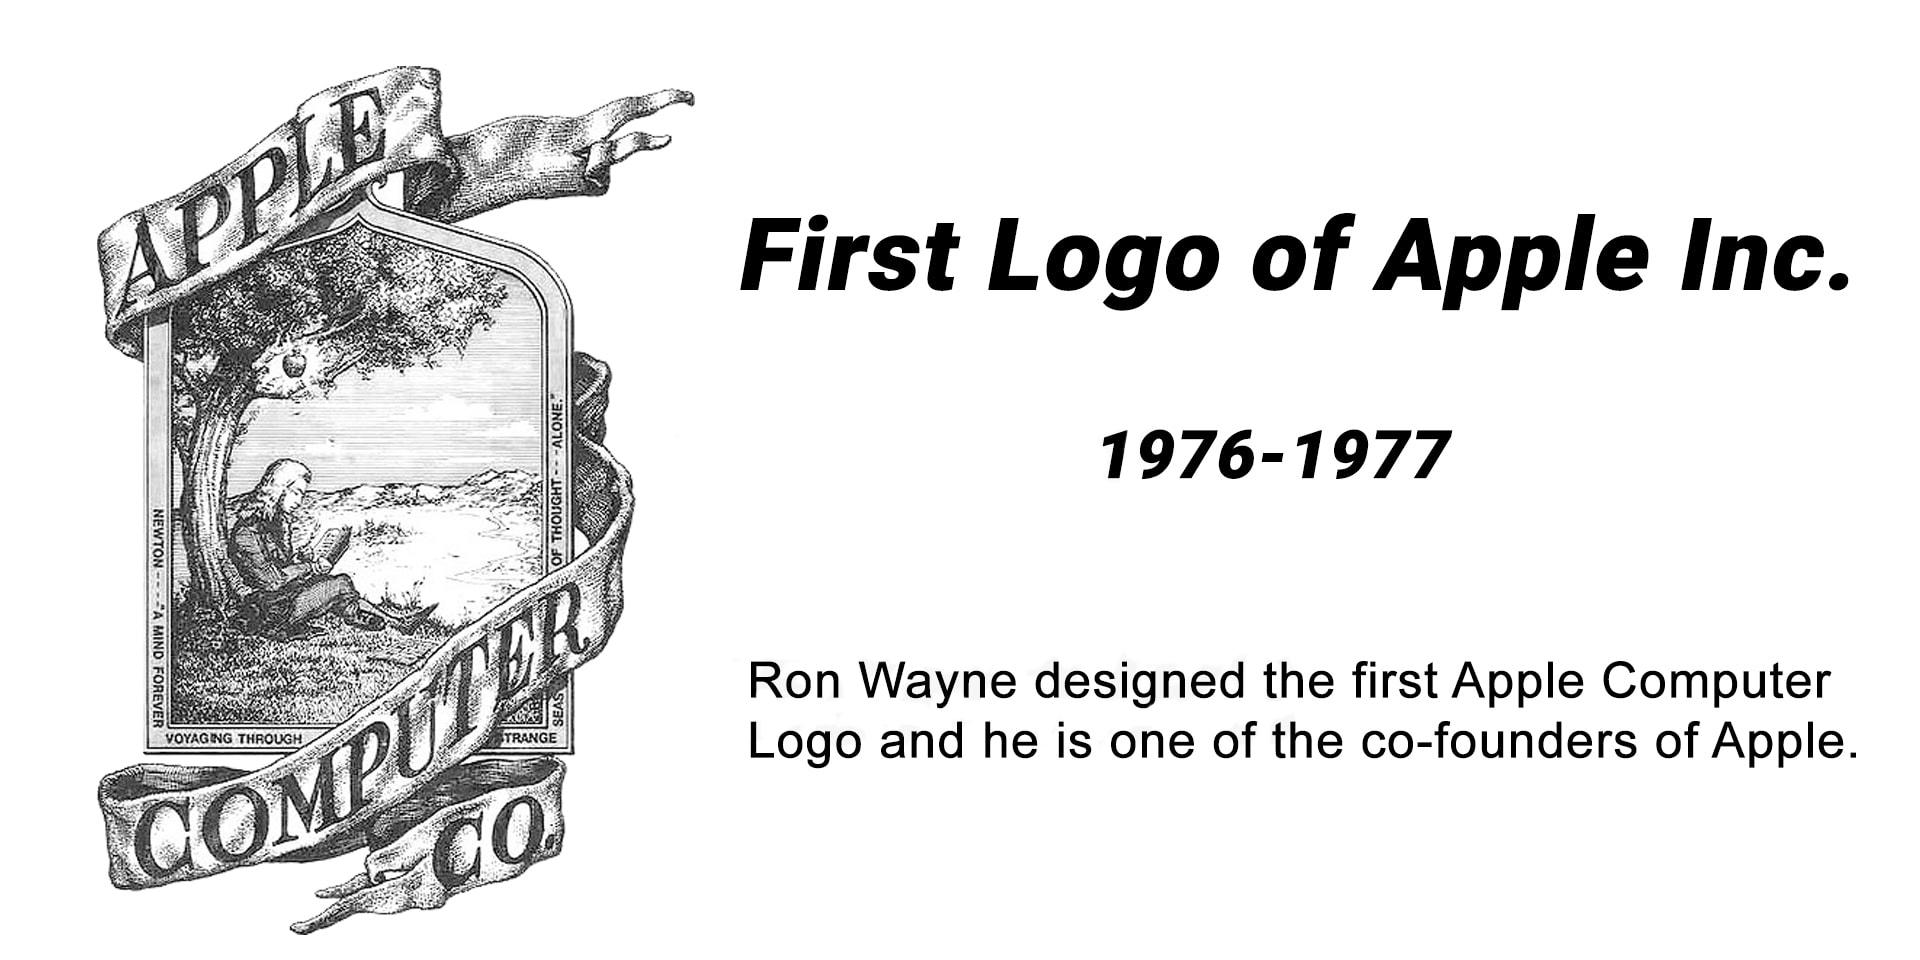 اولین طراحی لوگو اپل